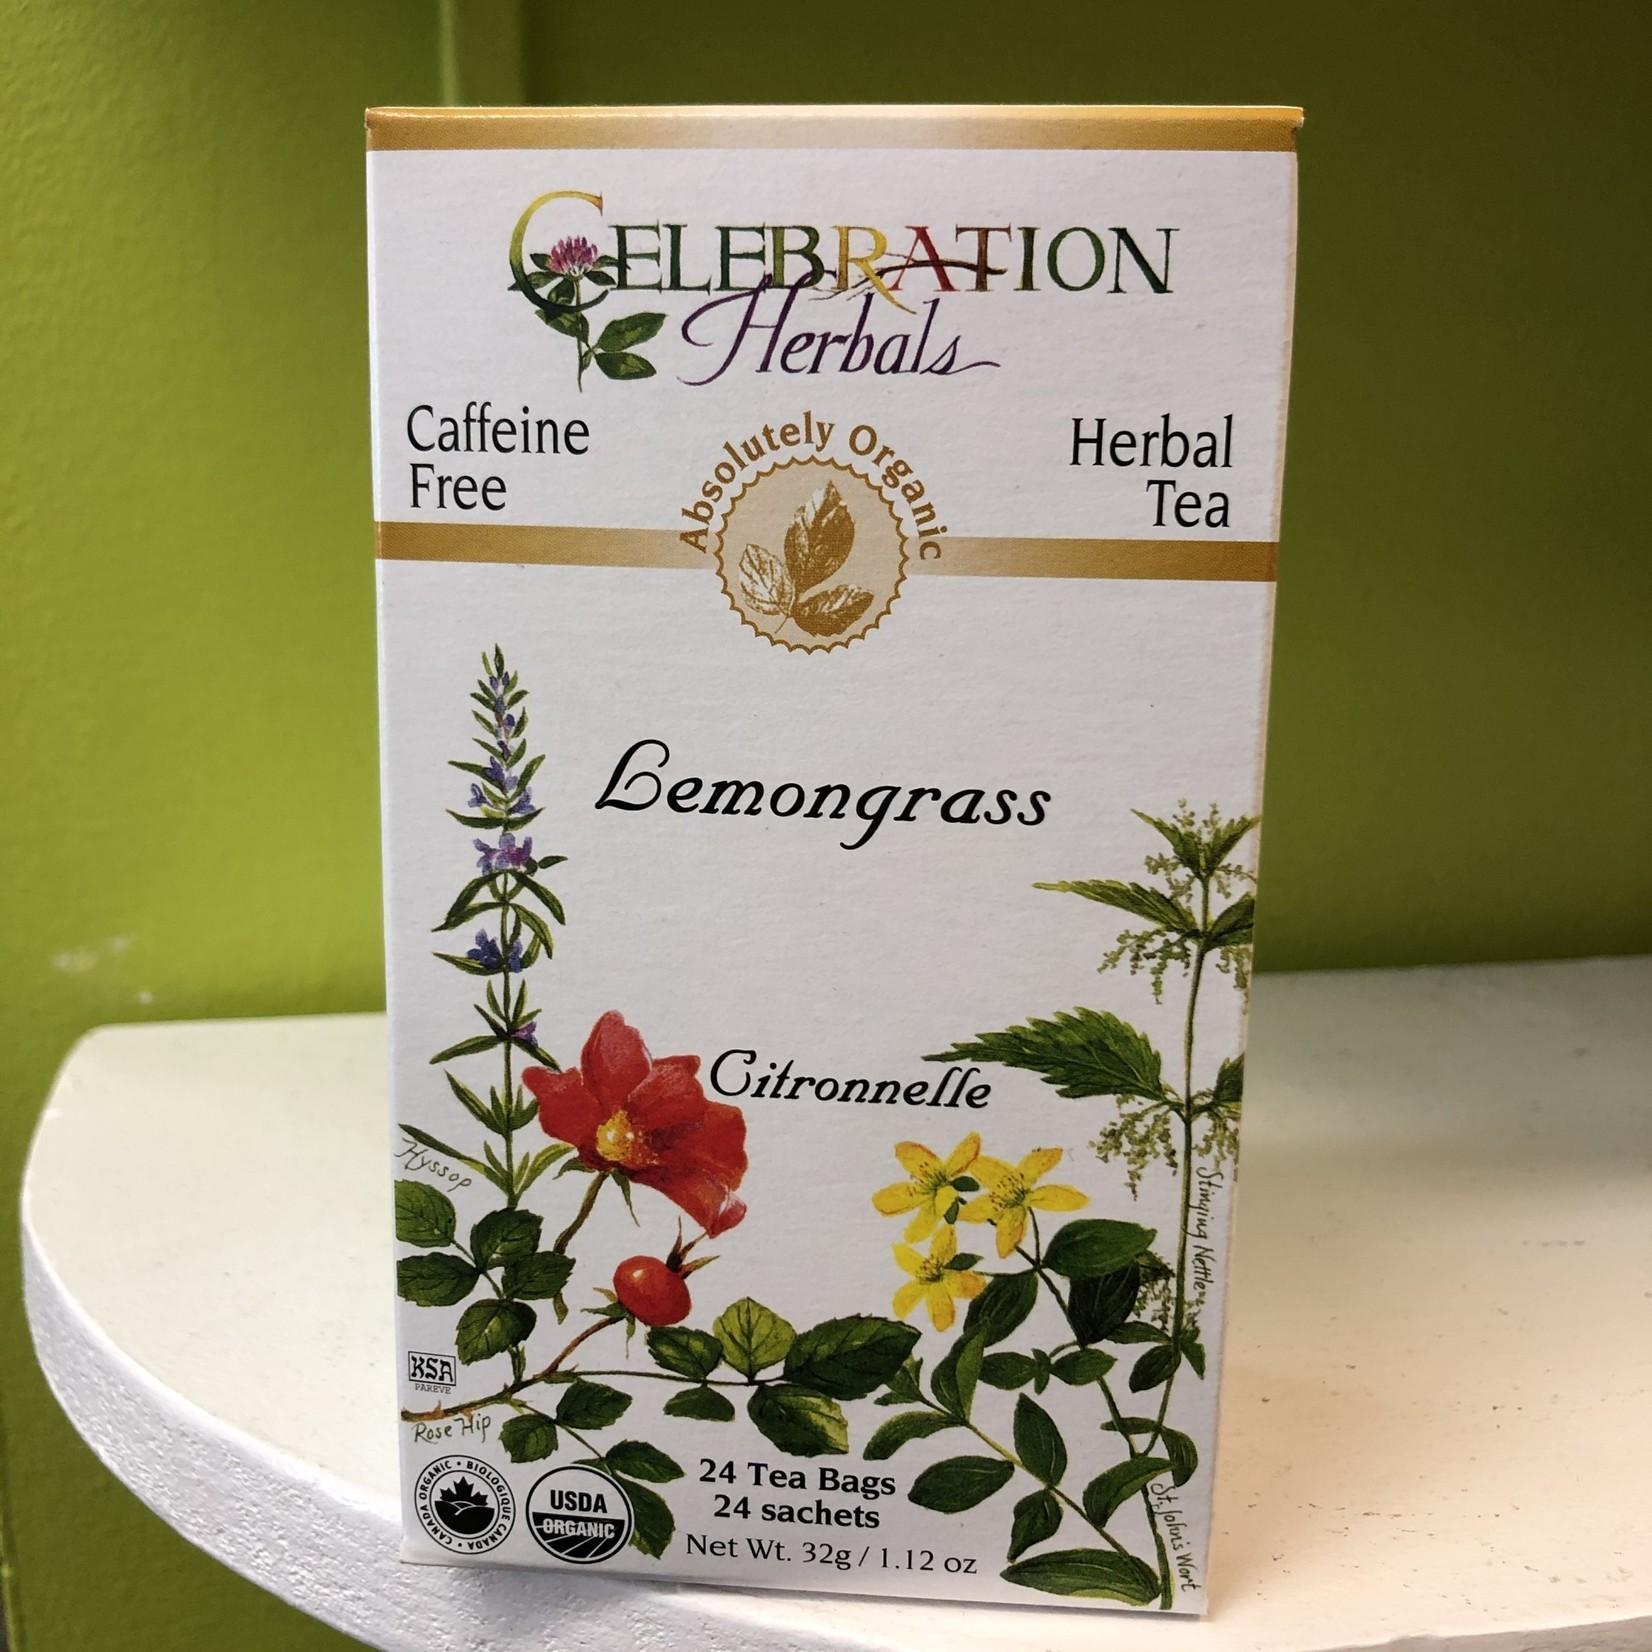 Celebration Herbals Celebration Herbals Lemongrass Tea 24 Tea Bags